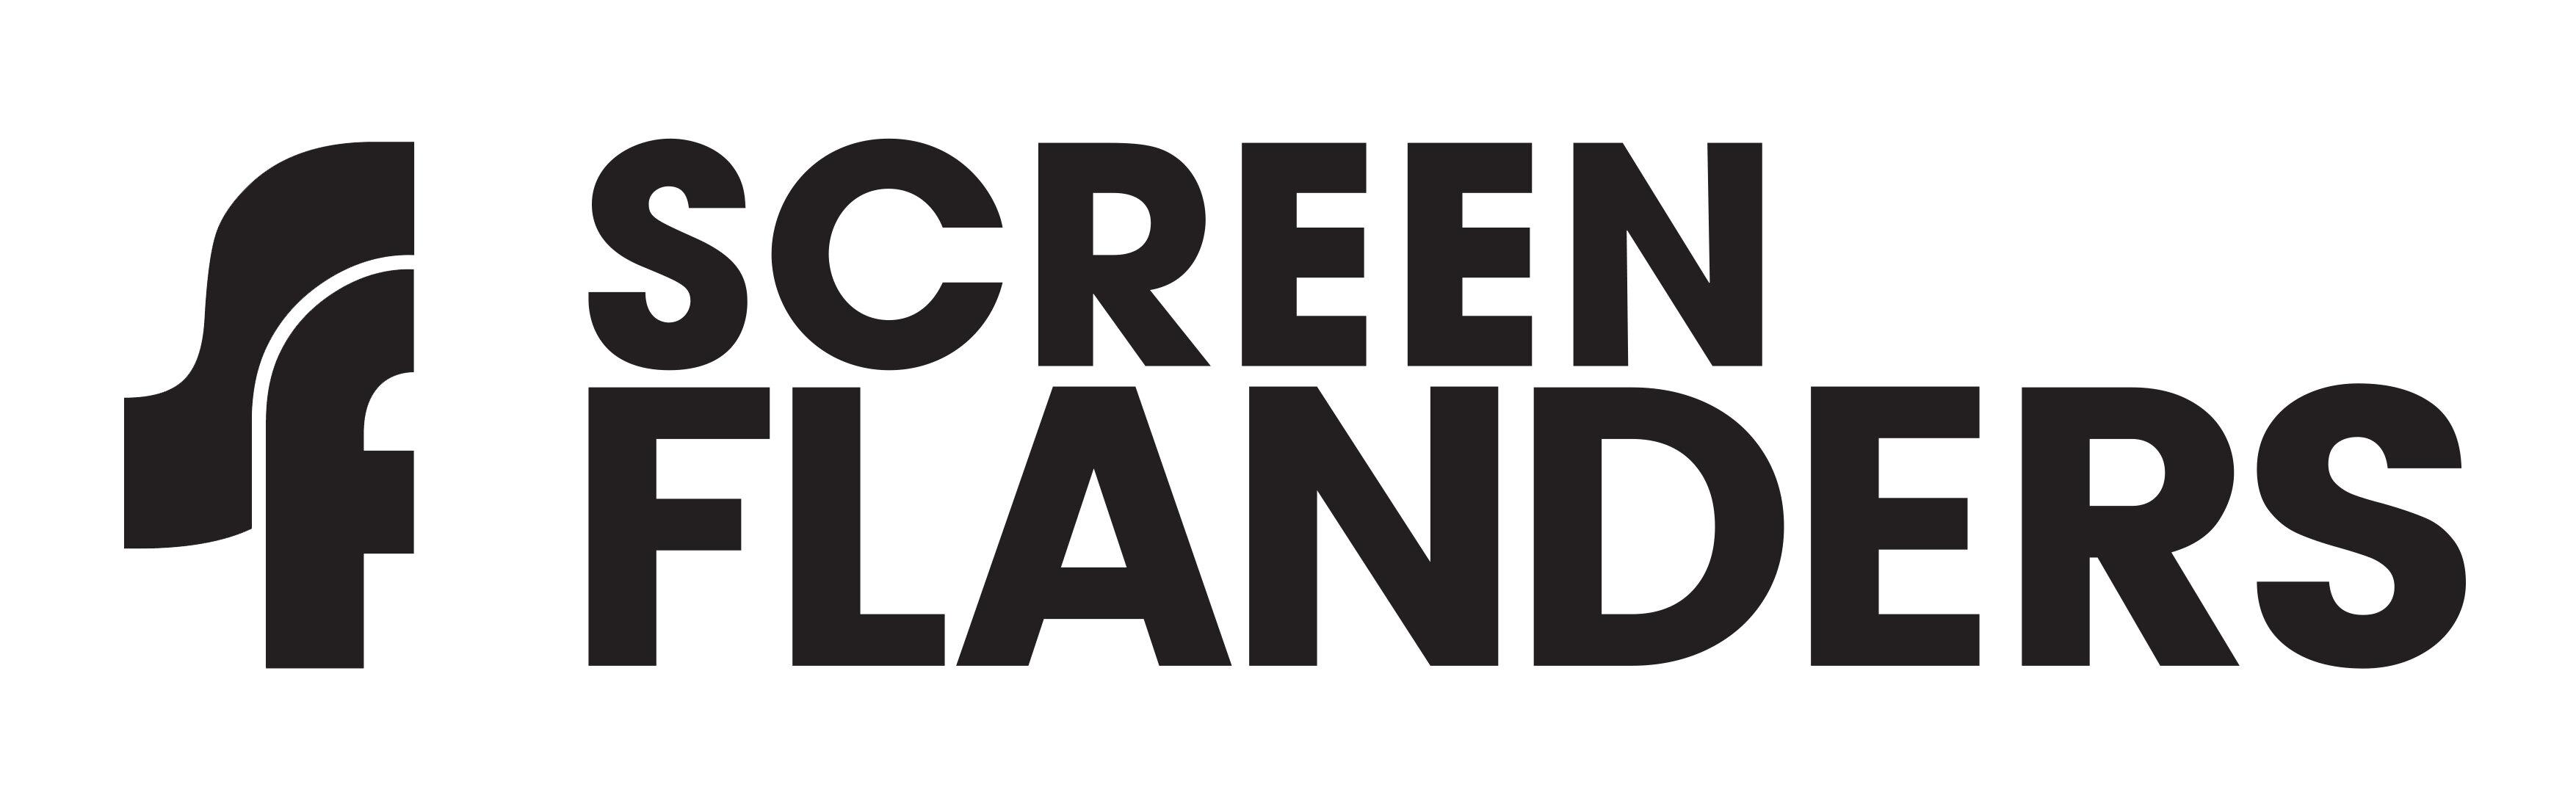 Screen Flanders